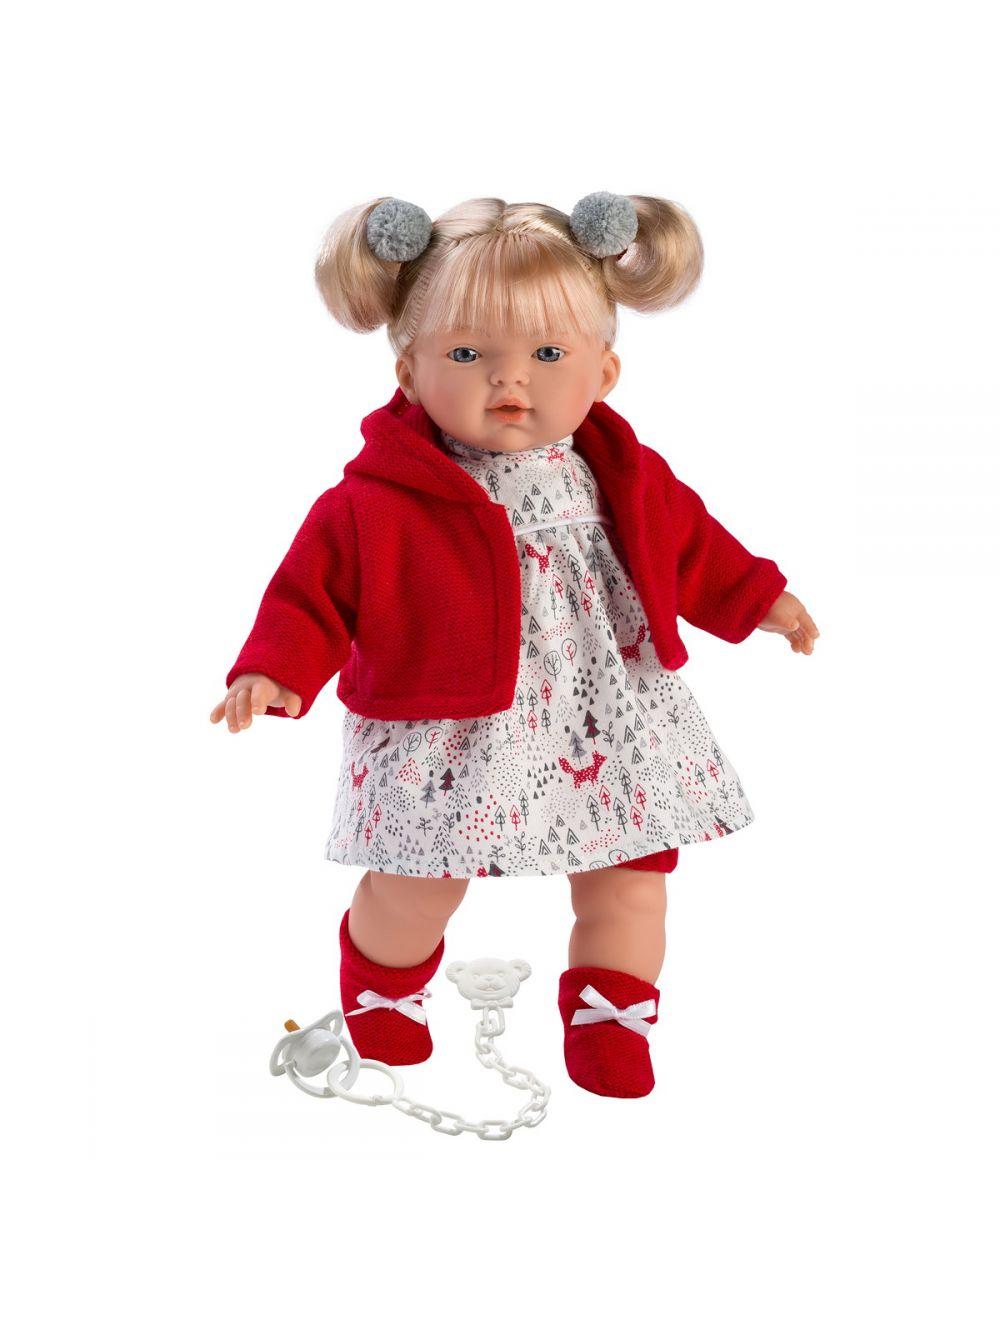 Llorens 33106 Lalka płacząca Aitana 33 cm czerwona blondynka